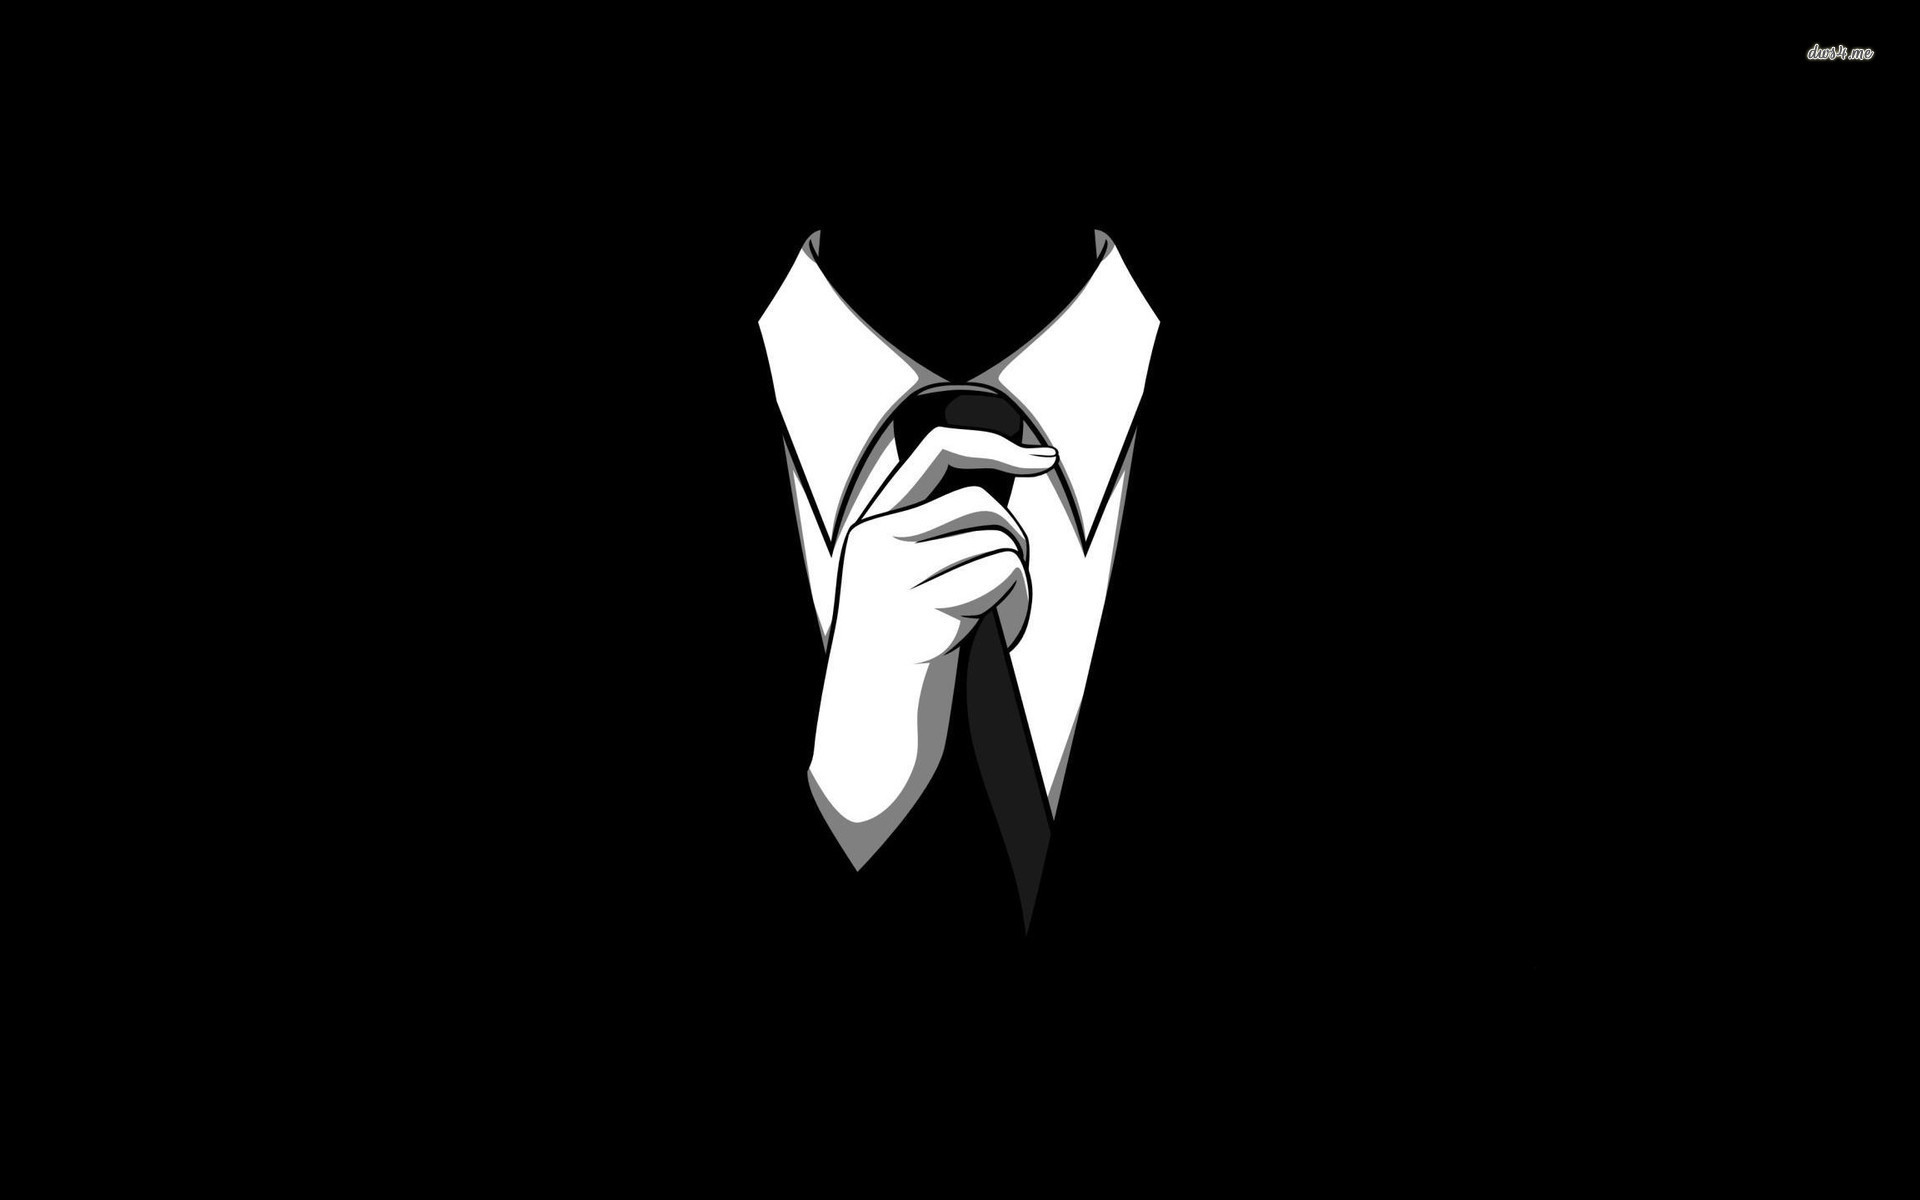 2560x1440 Hitman, Hitman Absolution, Hitman Absolution Game Logo